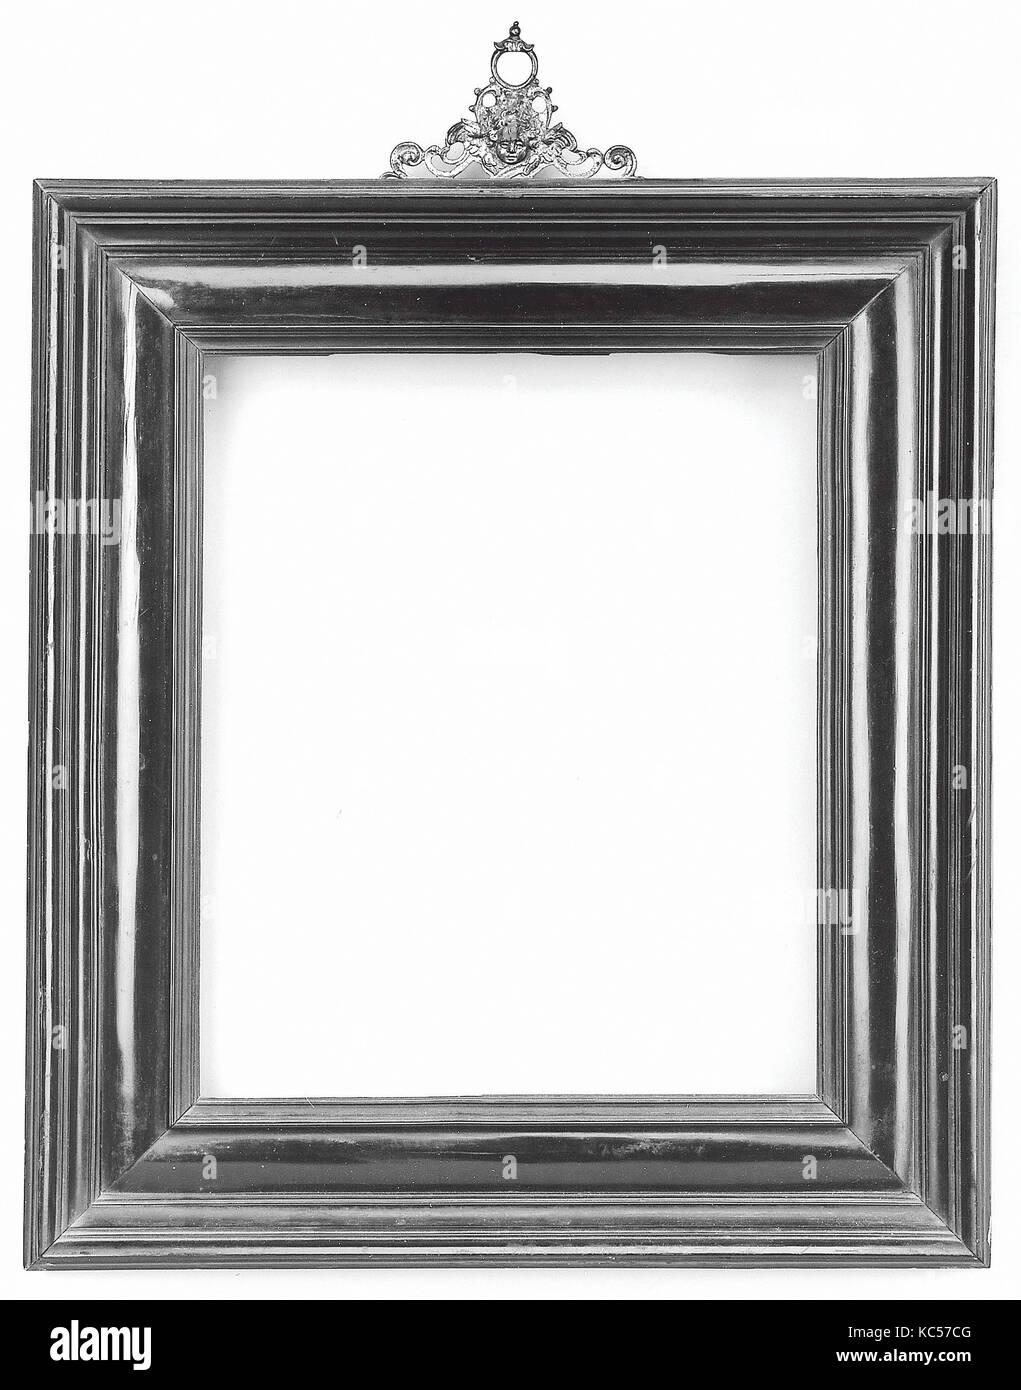 Cassetta frame, late 19th century, style mid-16th century - Stock Image